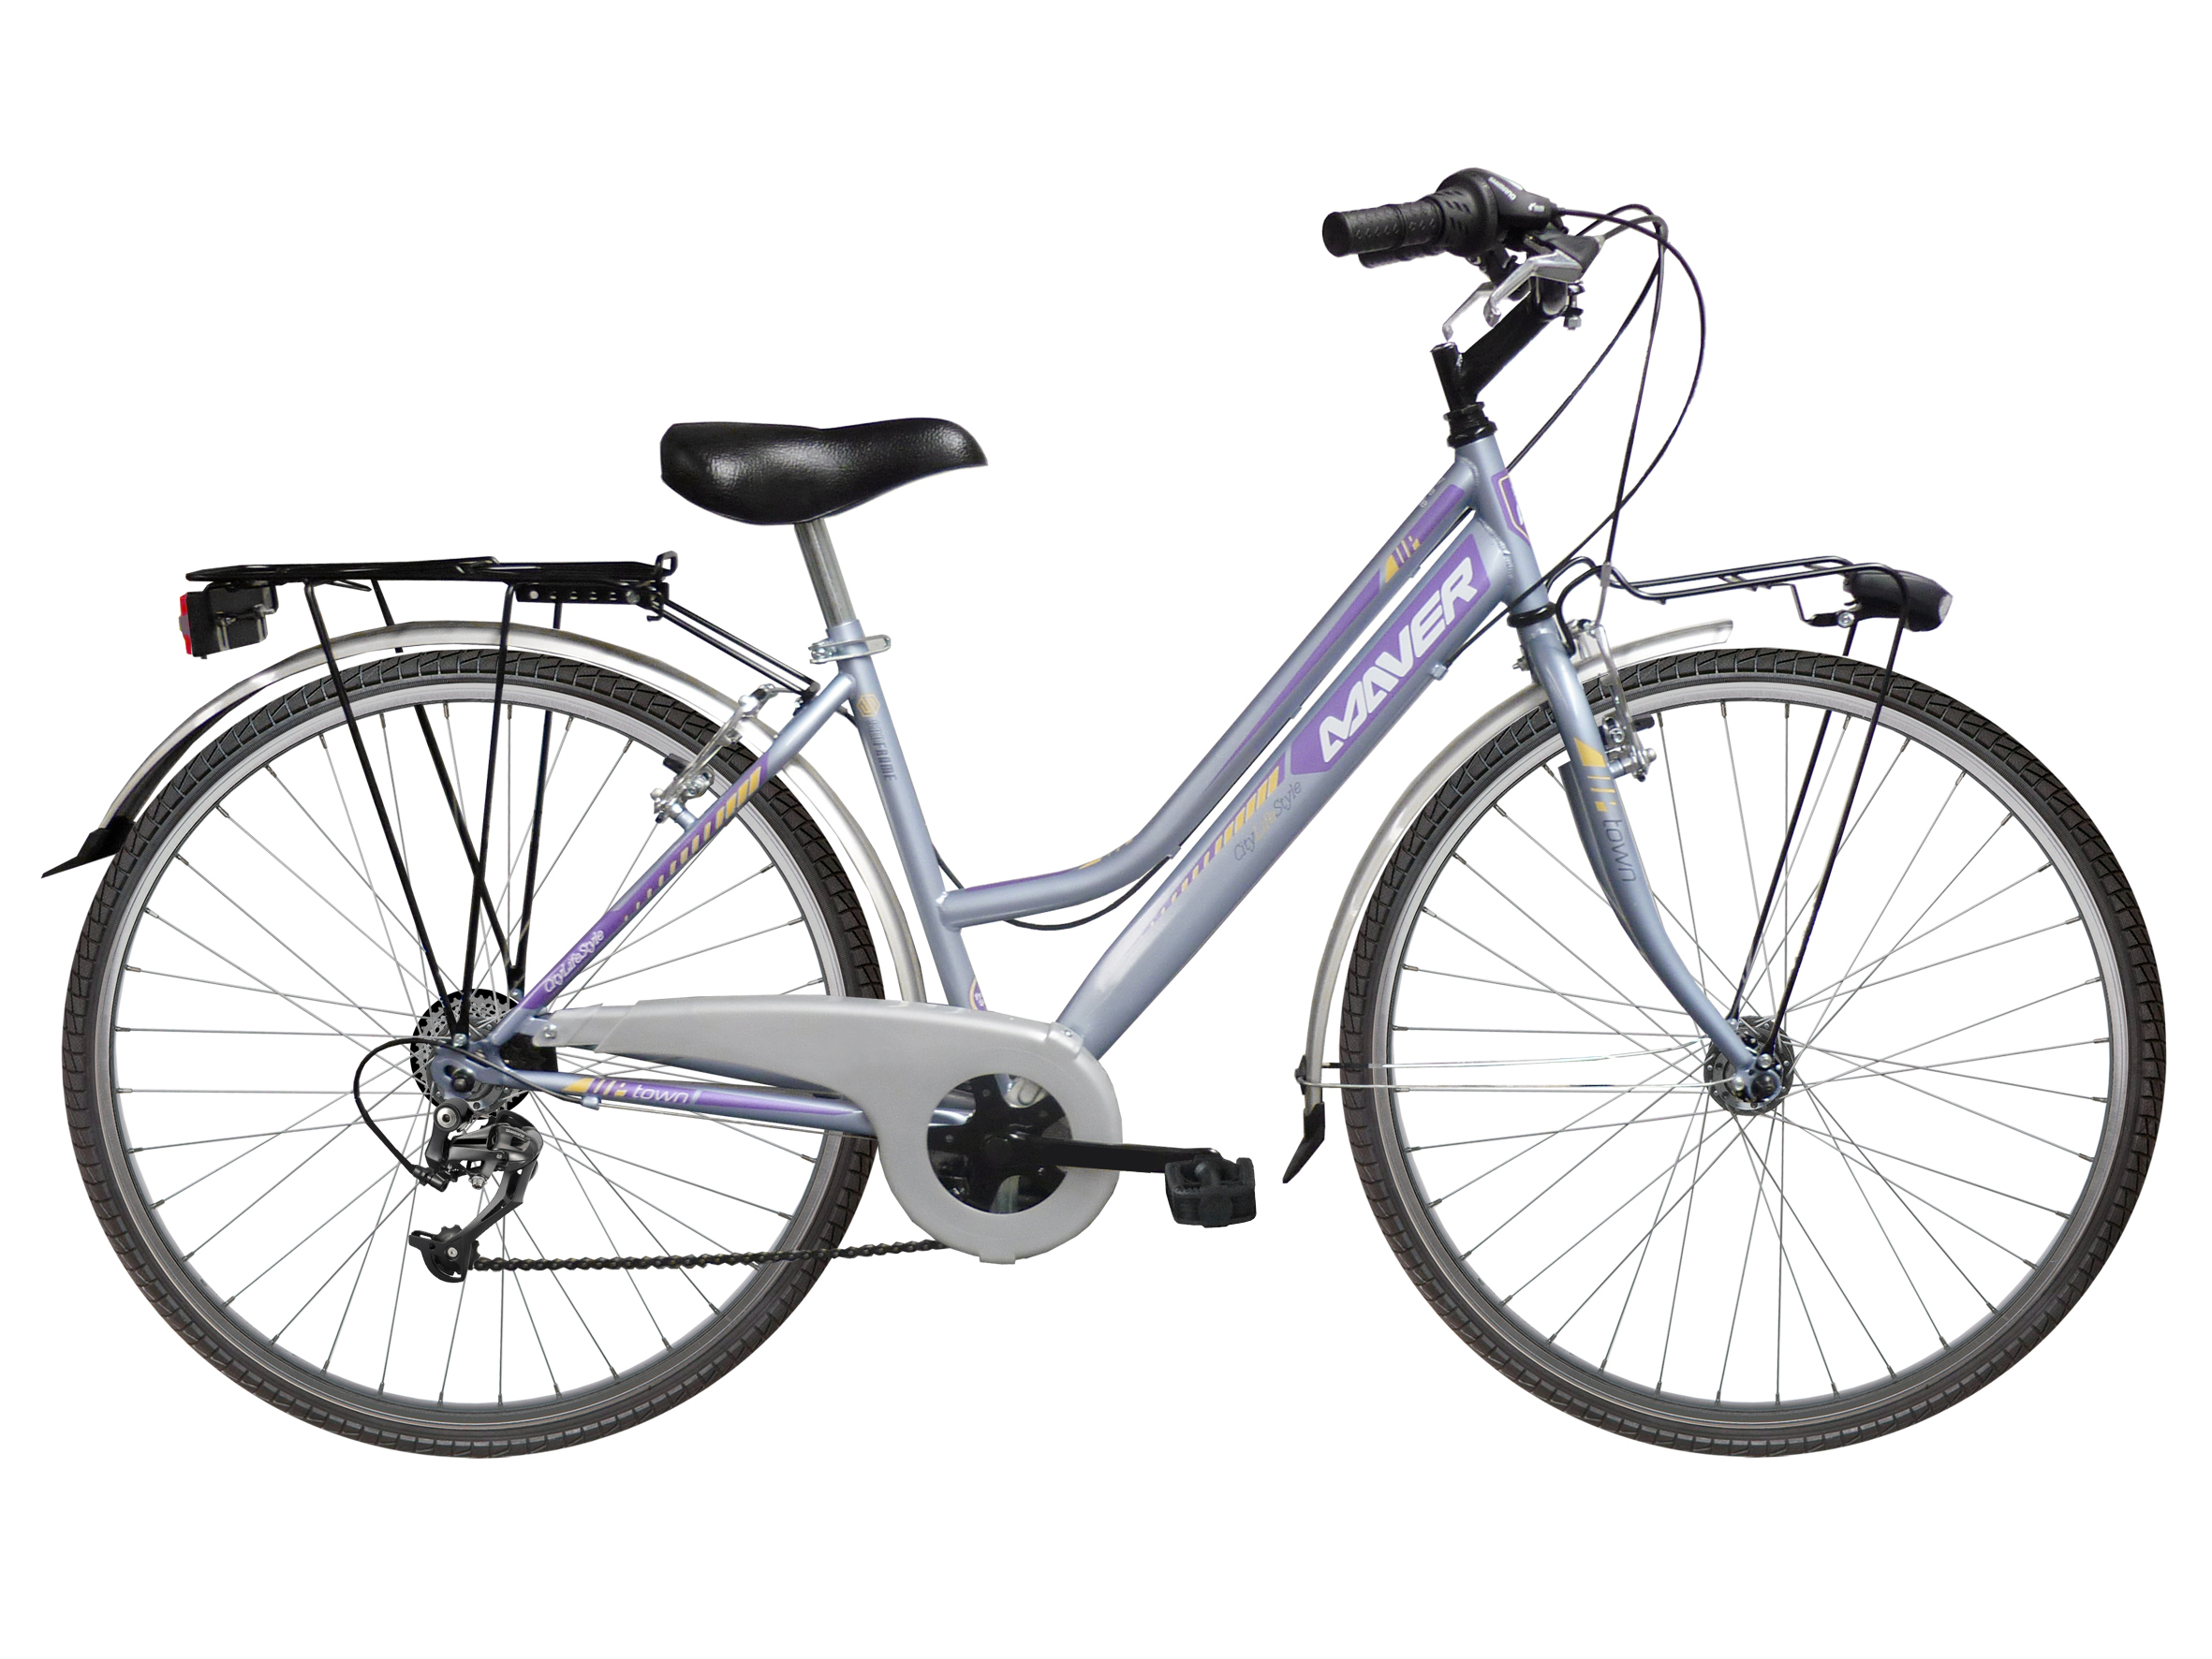 Bicicletta Senza Pedali Carrefour